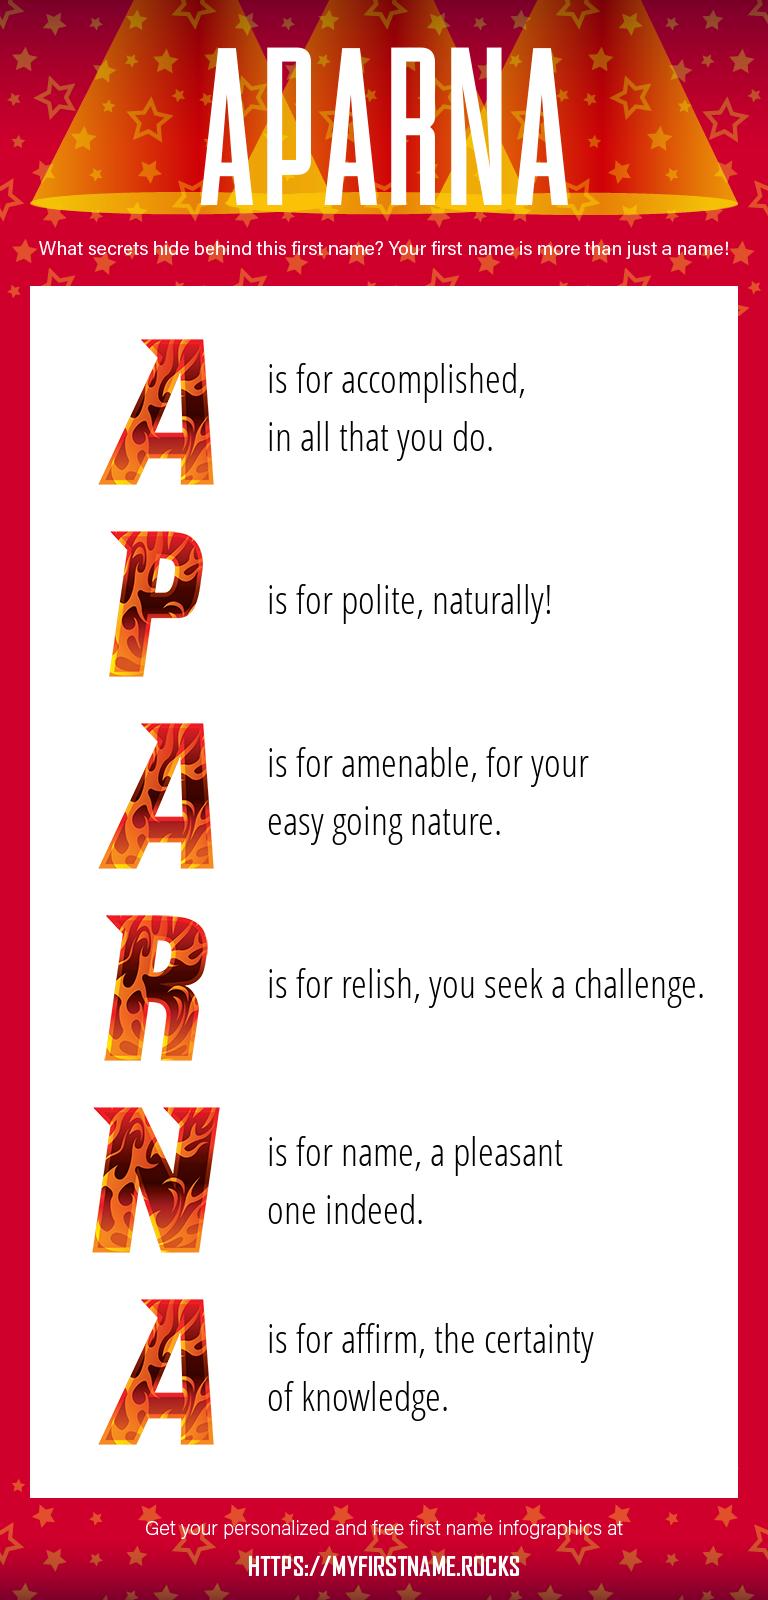 Aparna Infographics